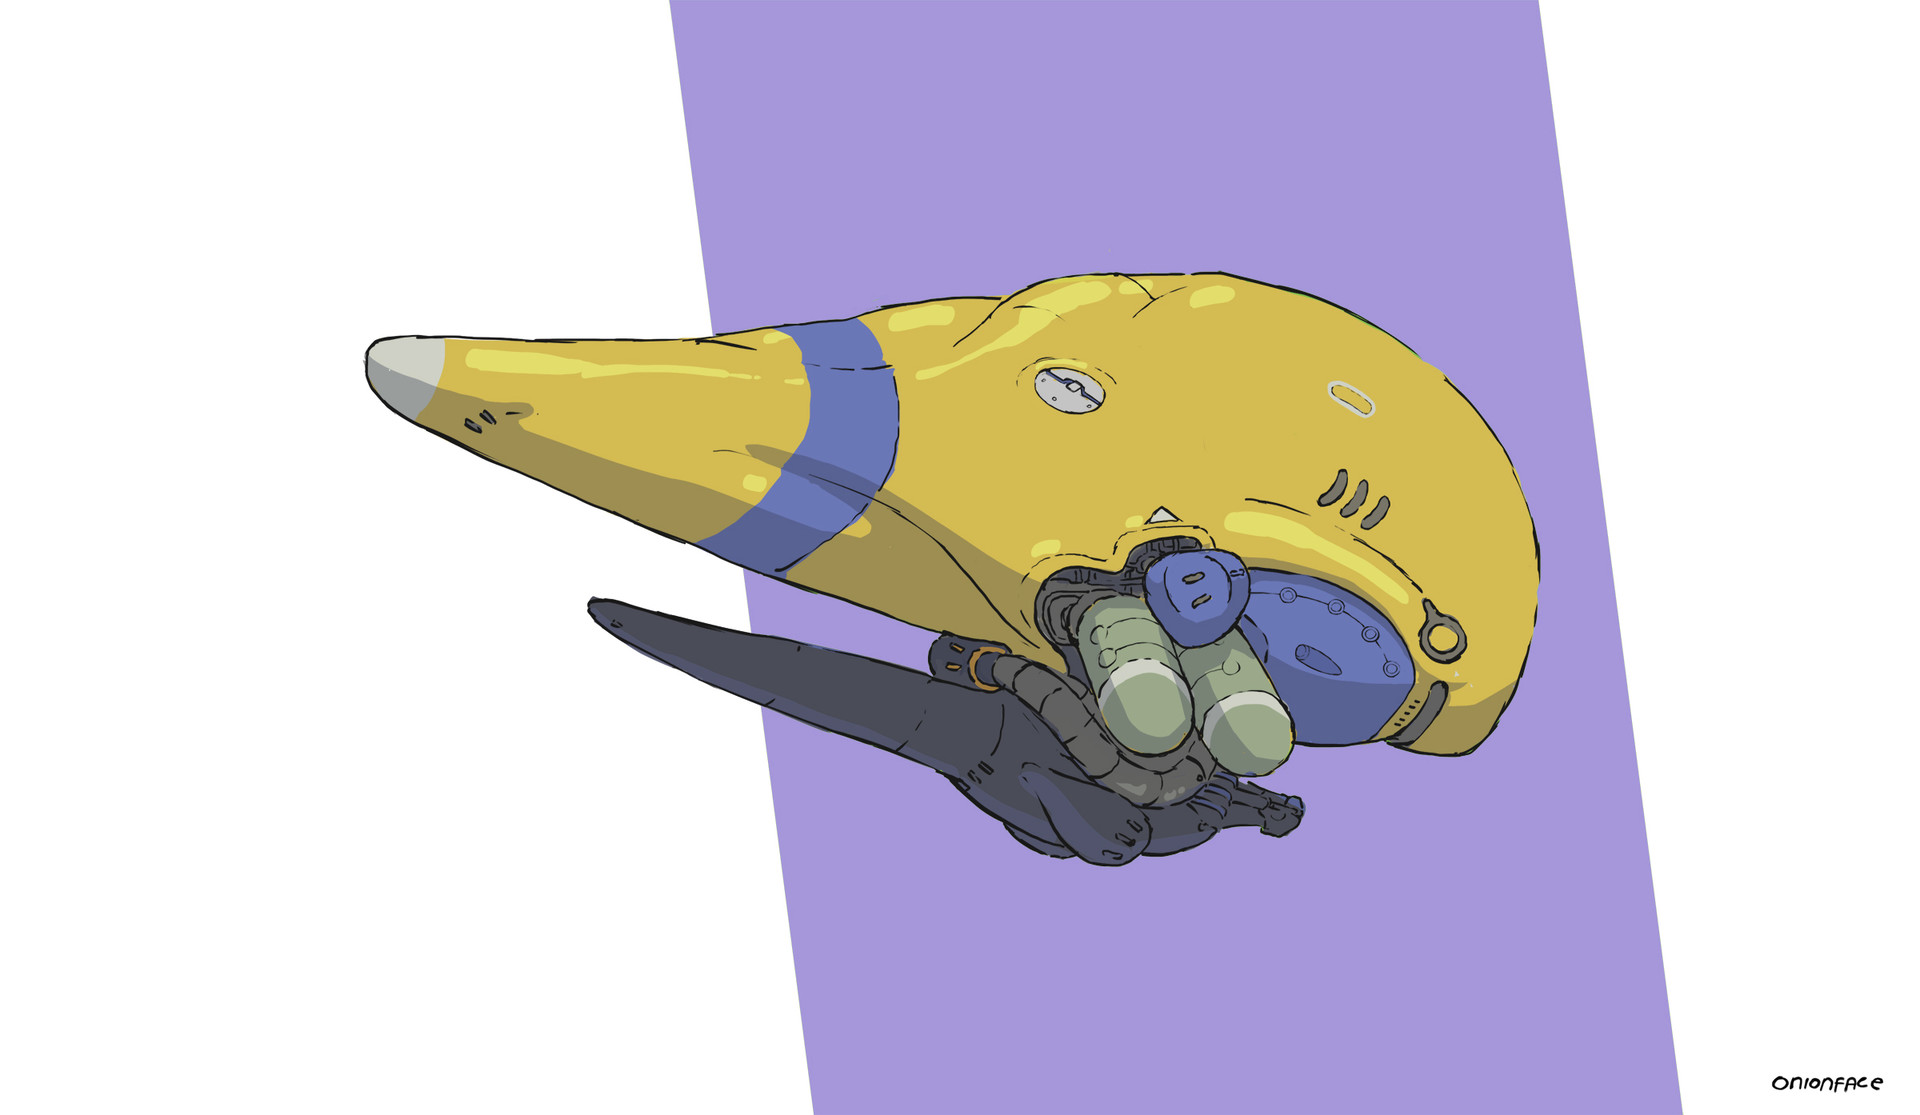 West clendinning spaceship cleanup 04